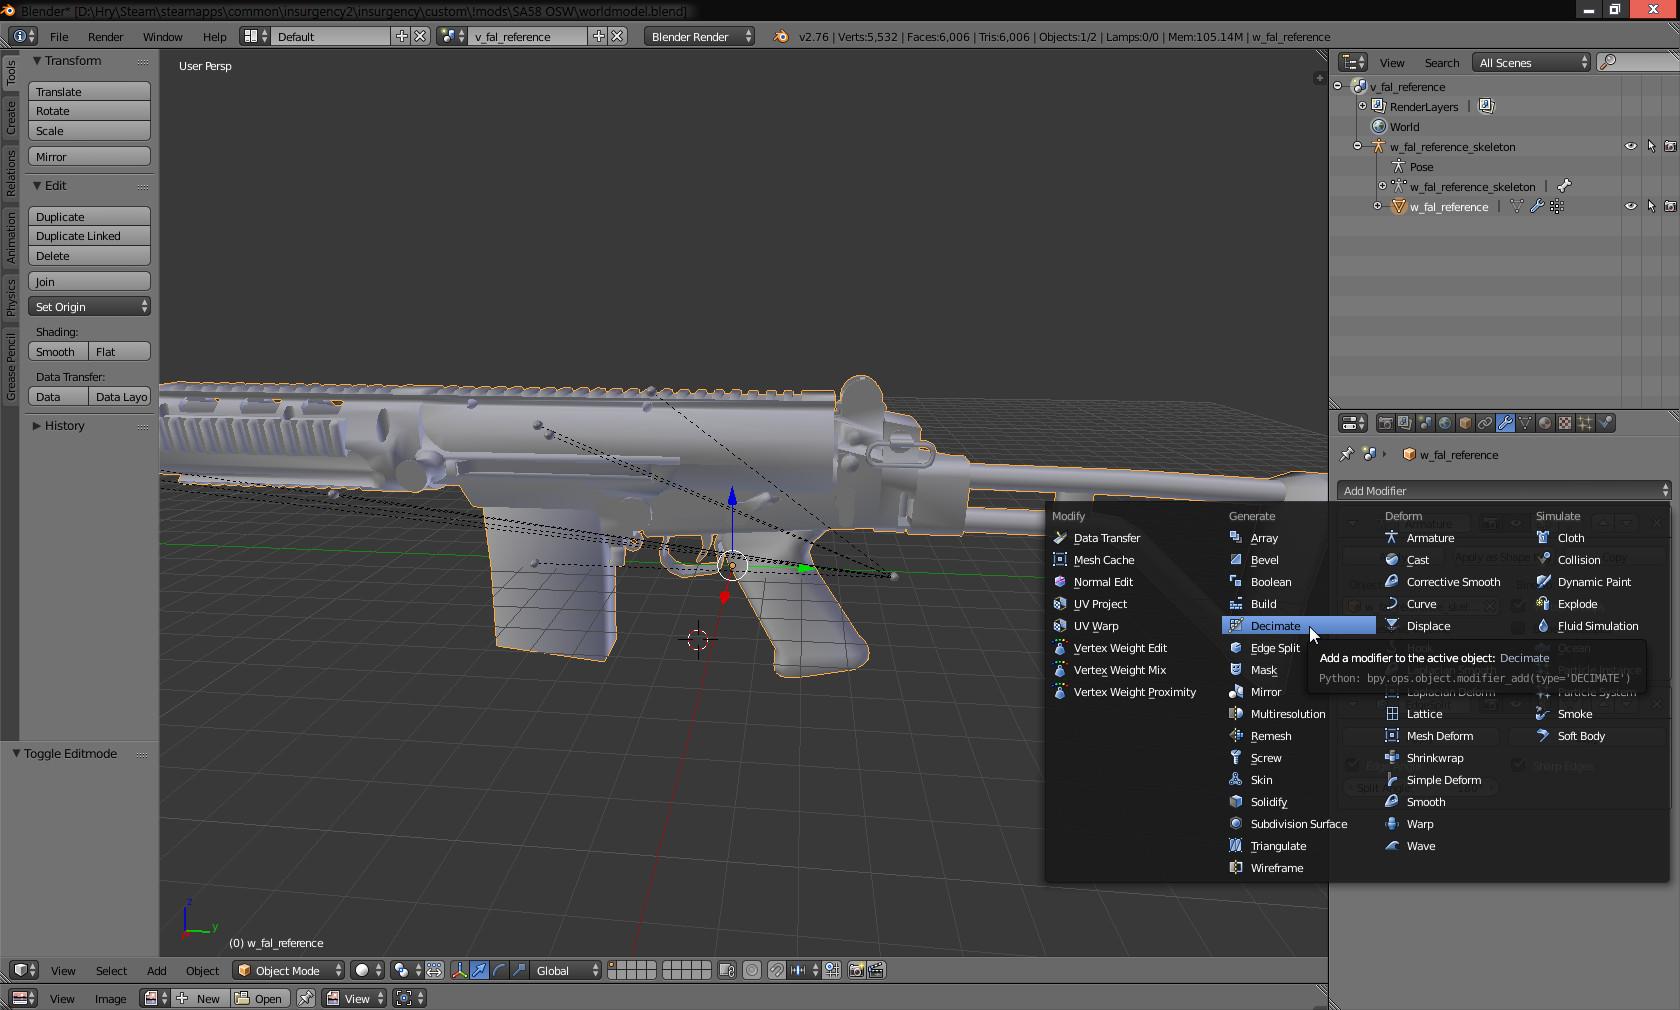 Steam Community :: Guide :: Insurgency weapon modding